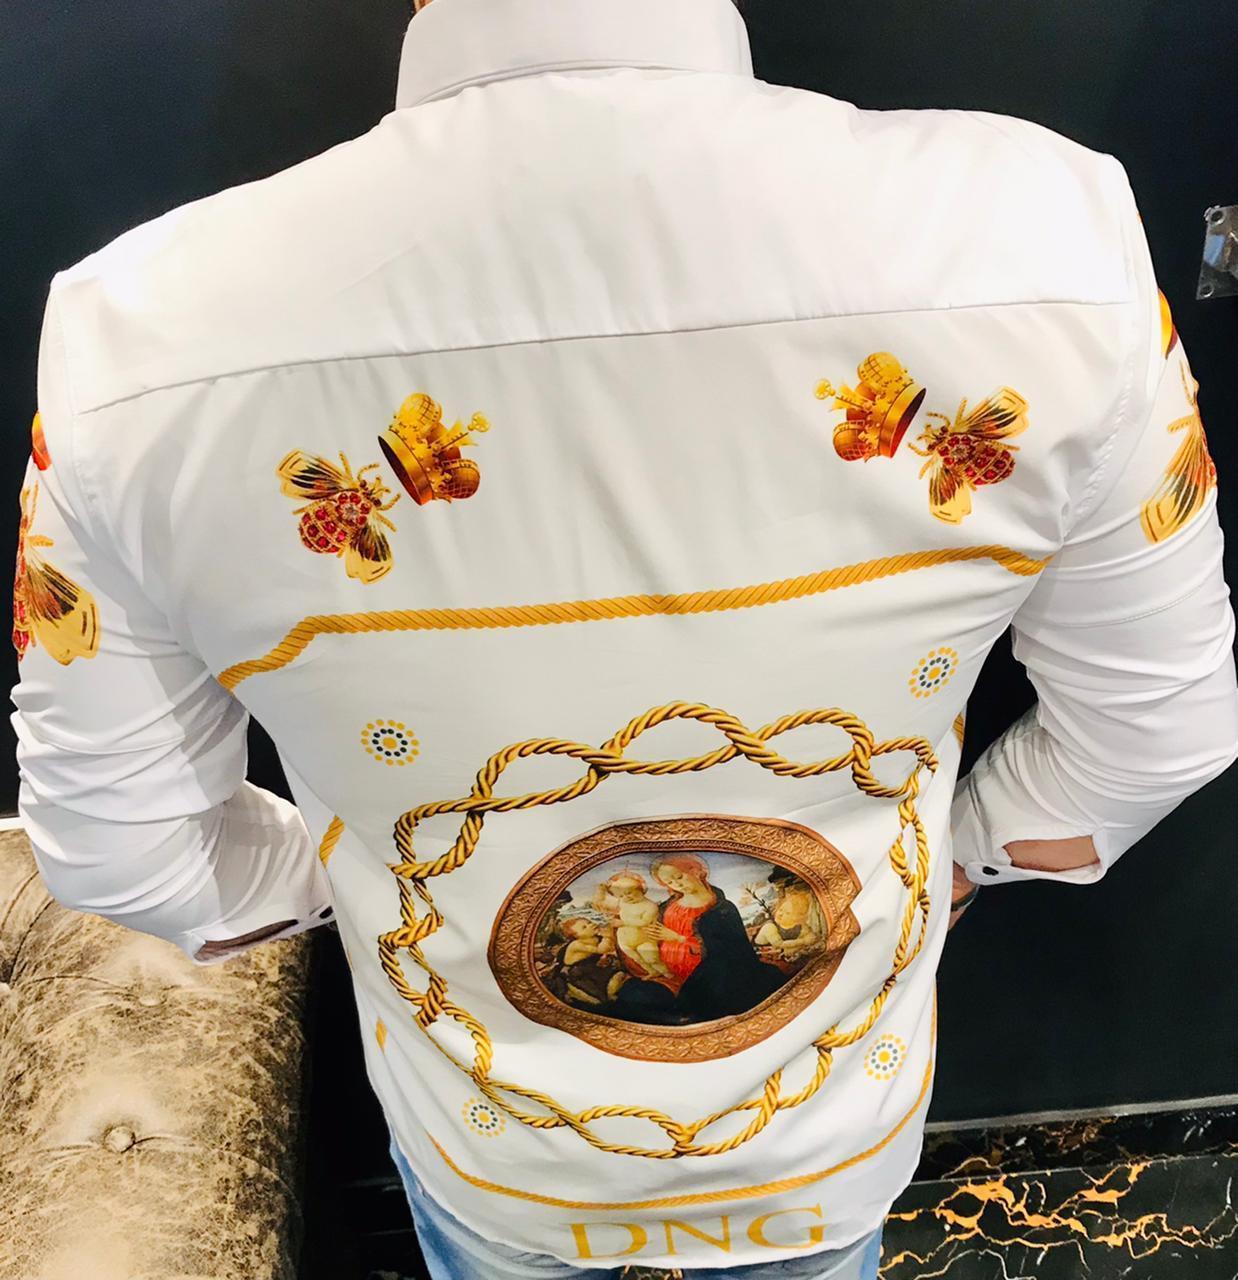 21 Inside Premium Imported Lycra Shirt For men's